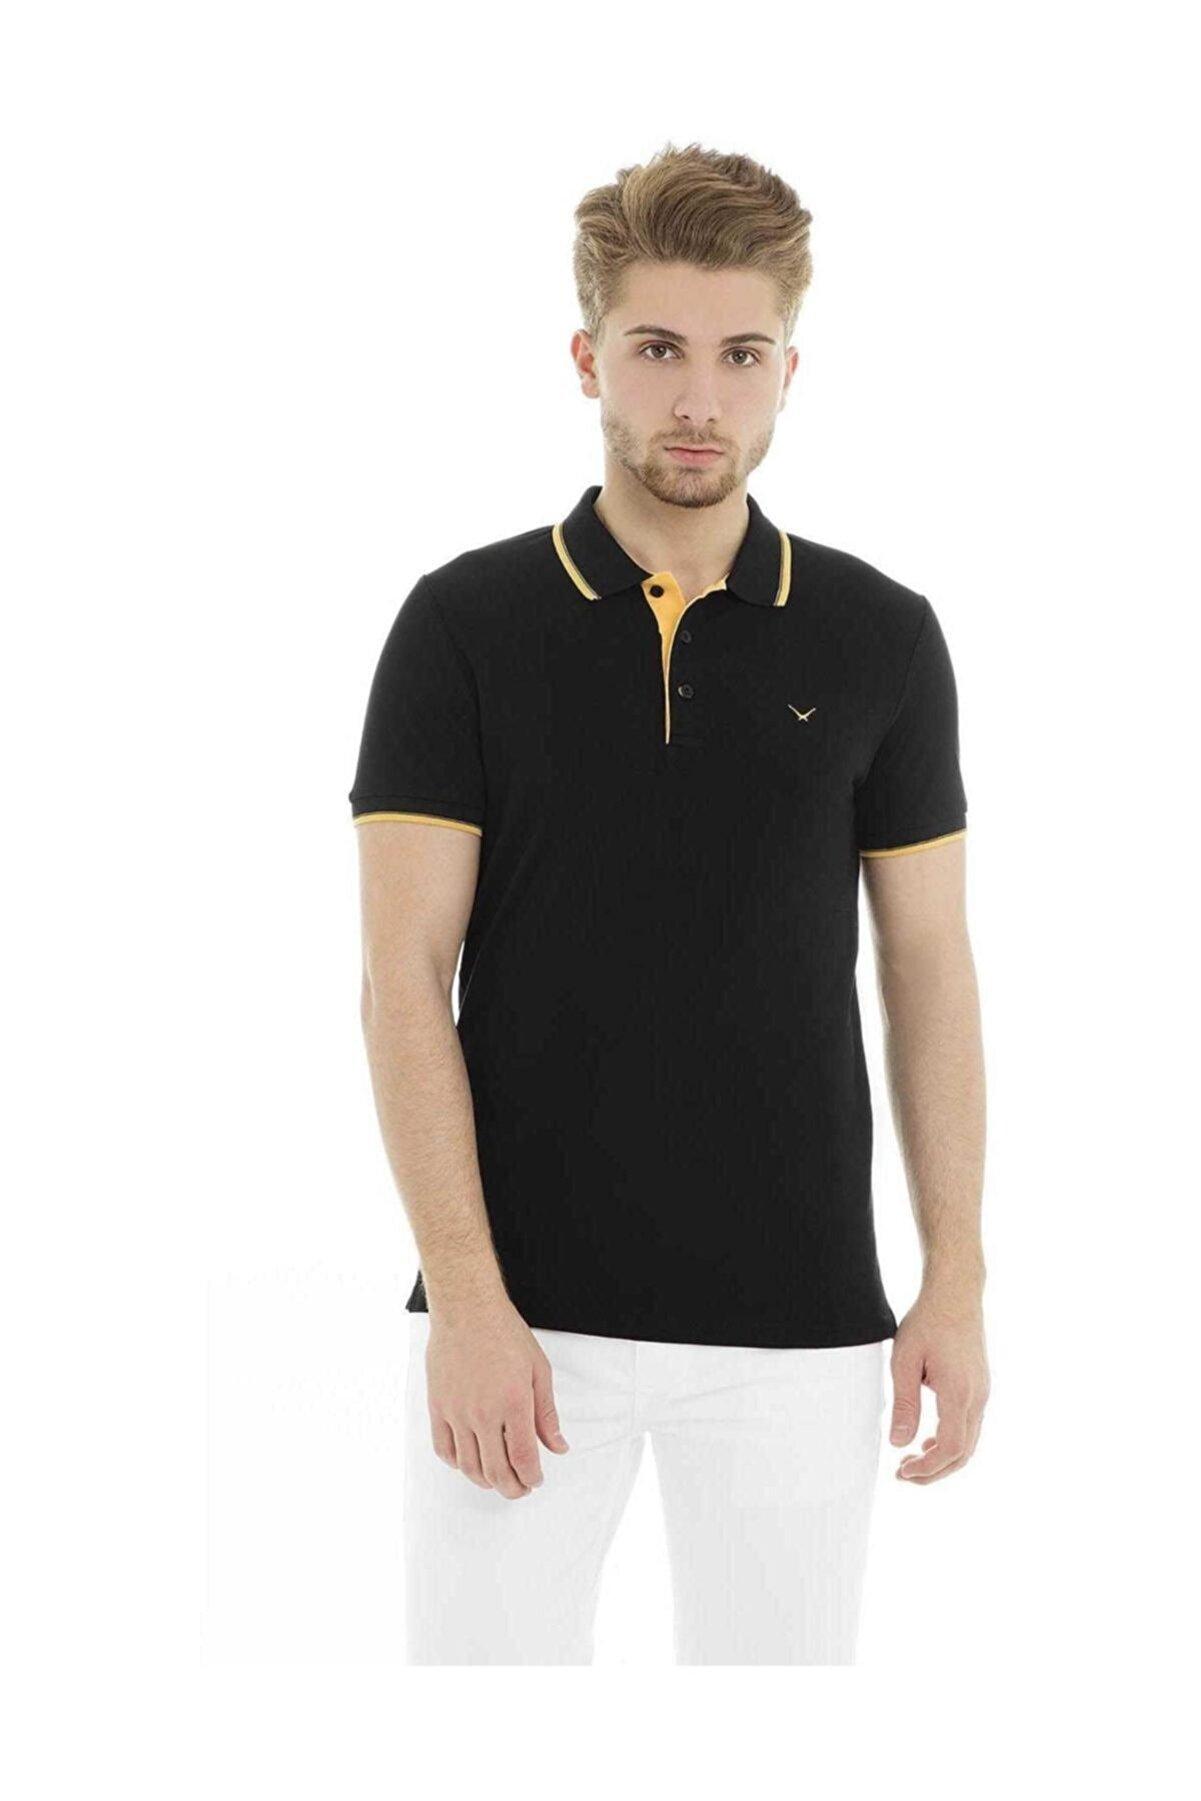 Cazador Erkek Siyah T-Shirt - Cdr4614-19YCEEOM4614